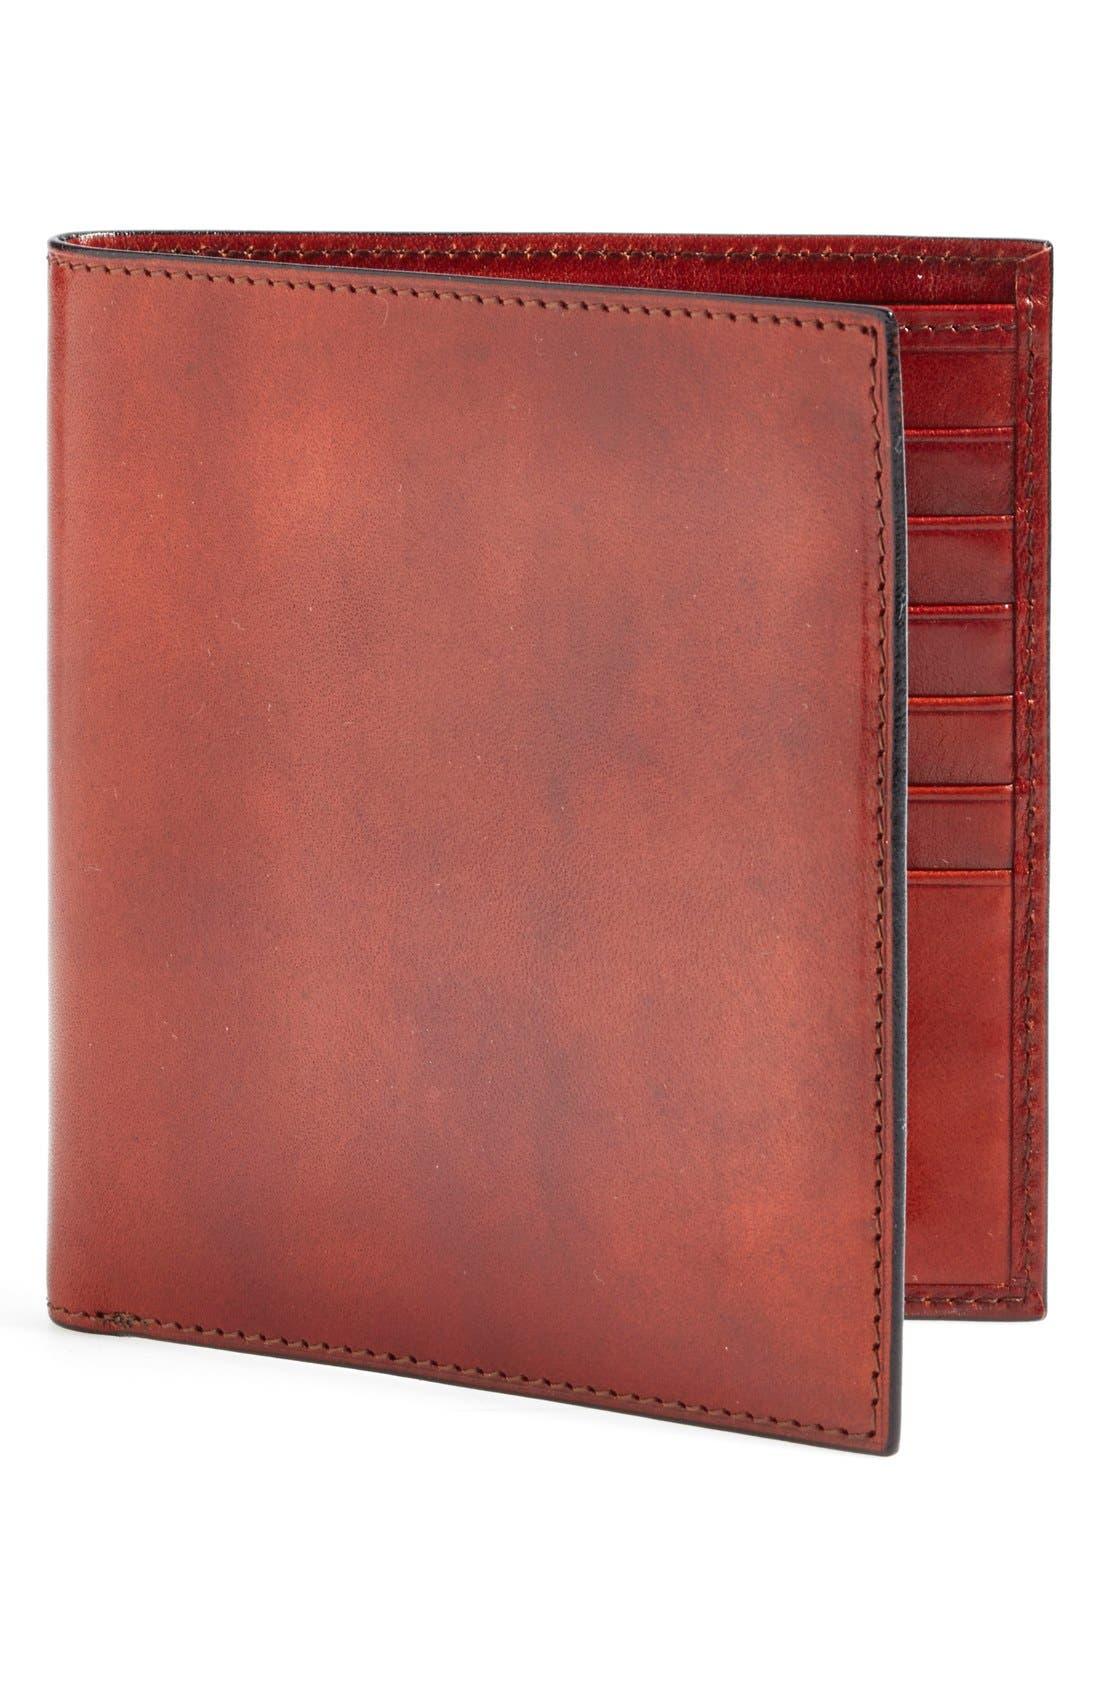 'Old Leather' Credit Wallet,                         Main,                         color, Cognac